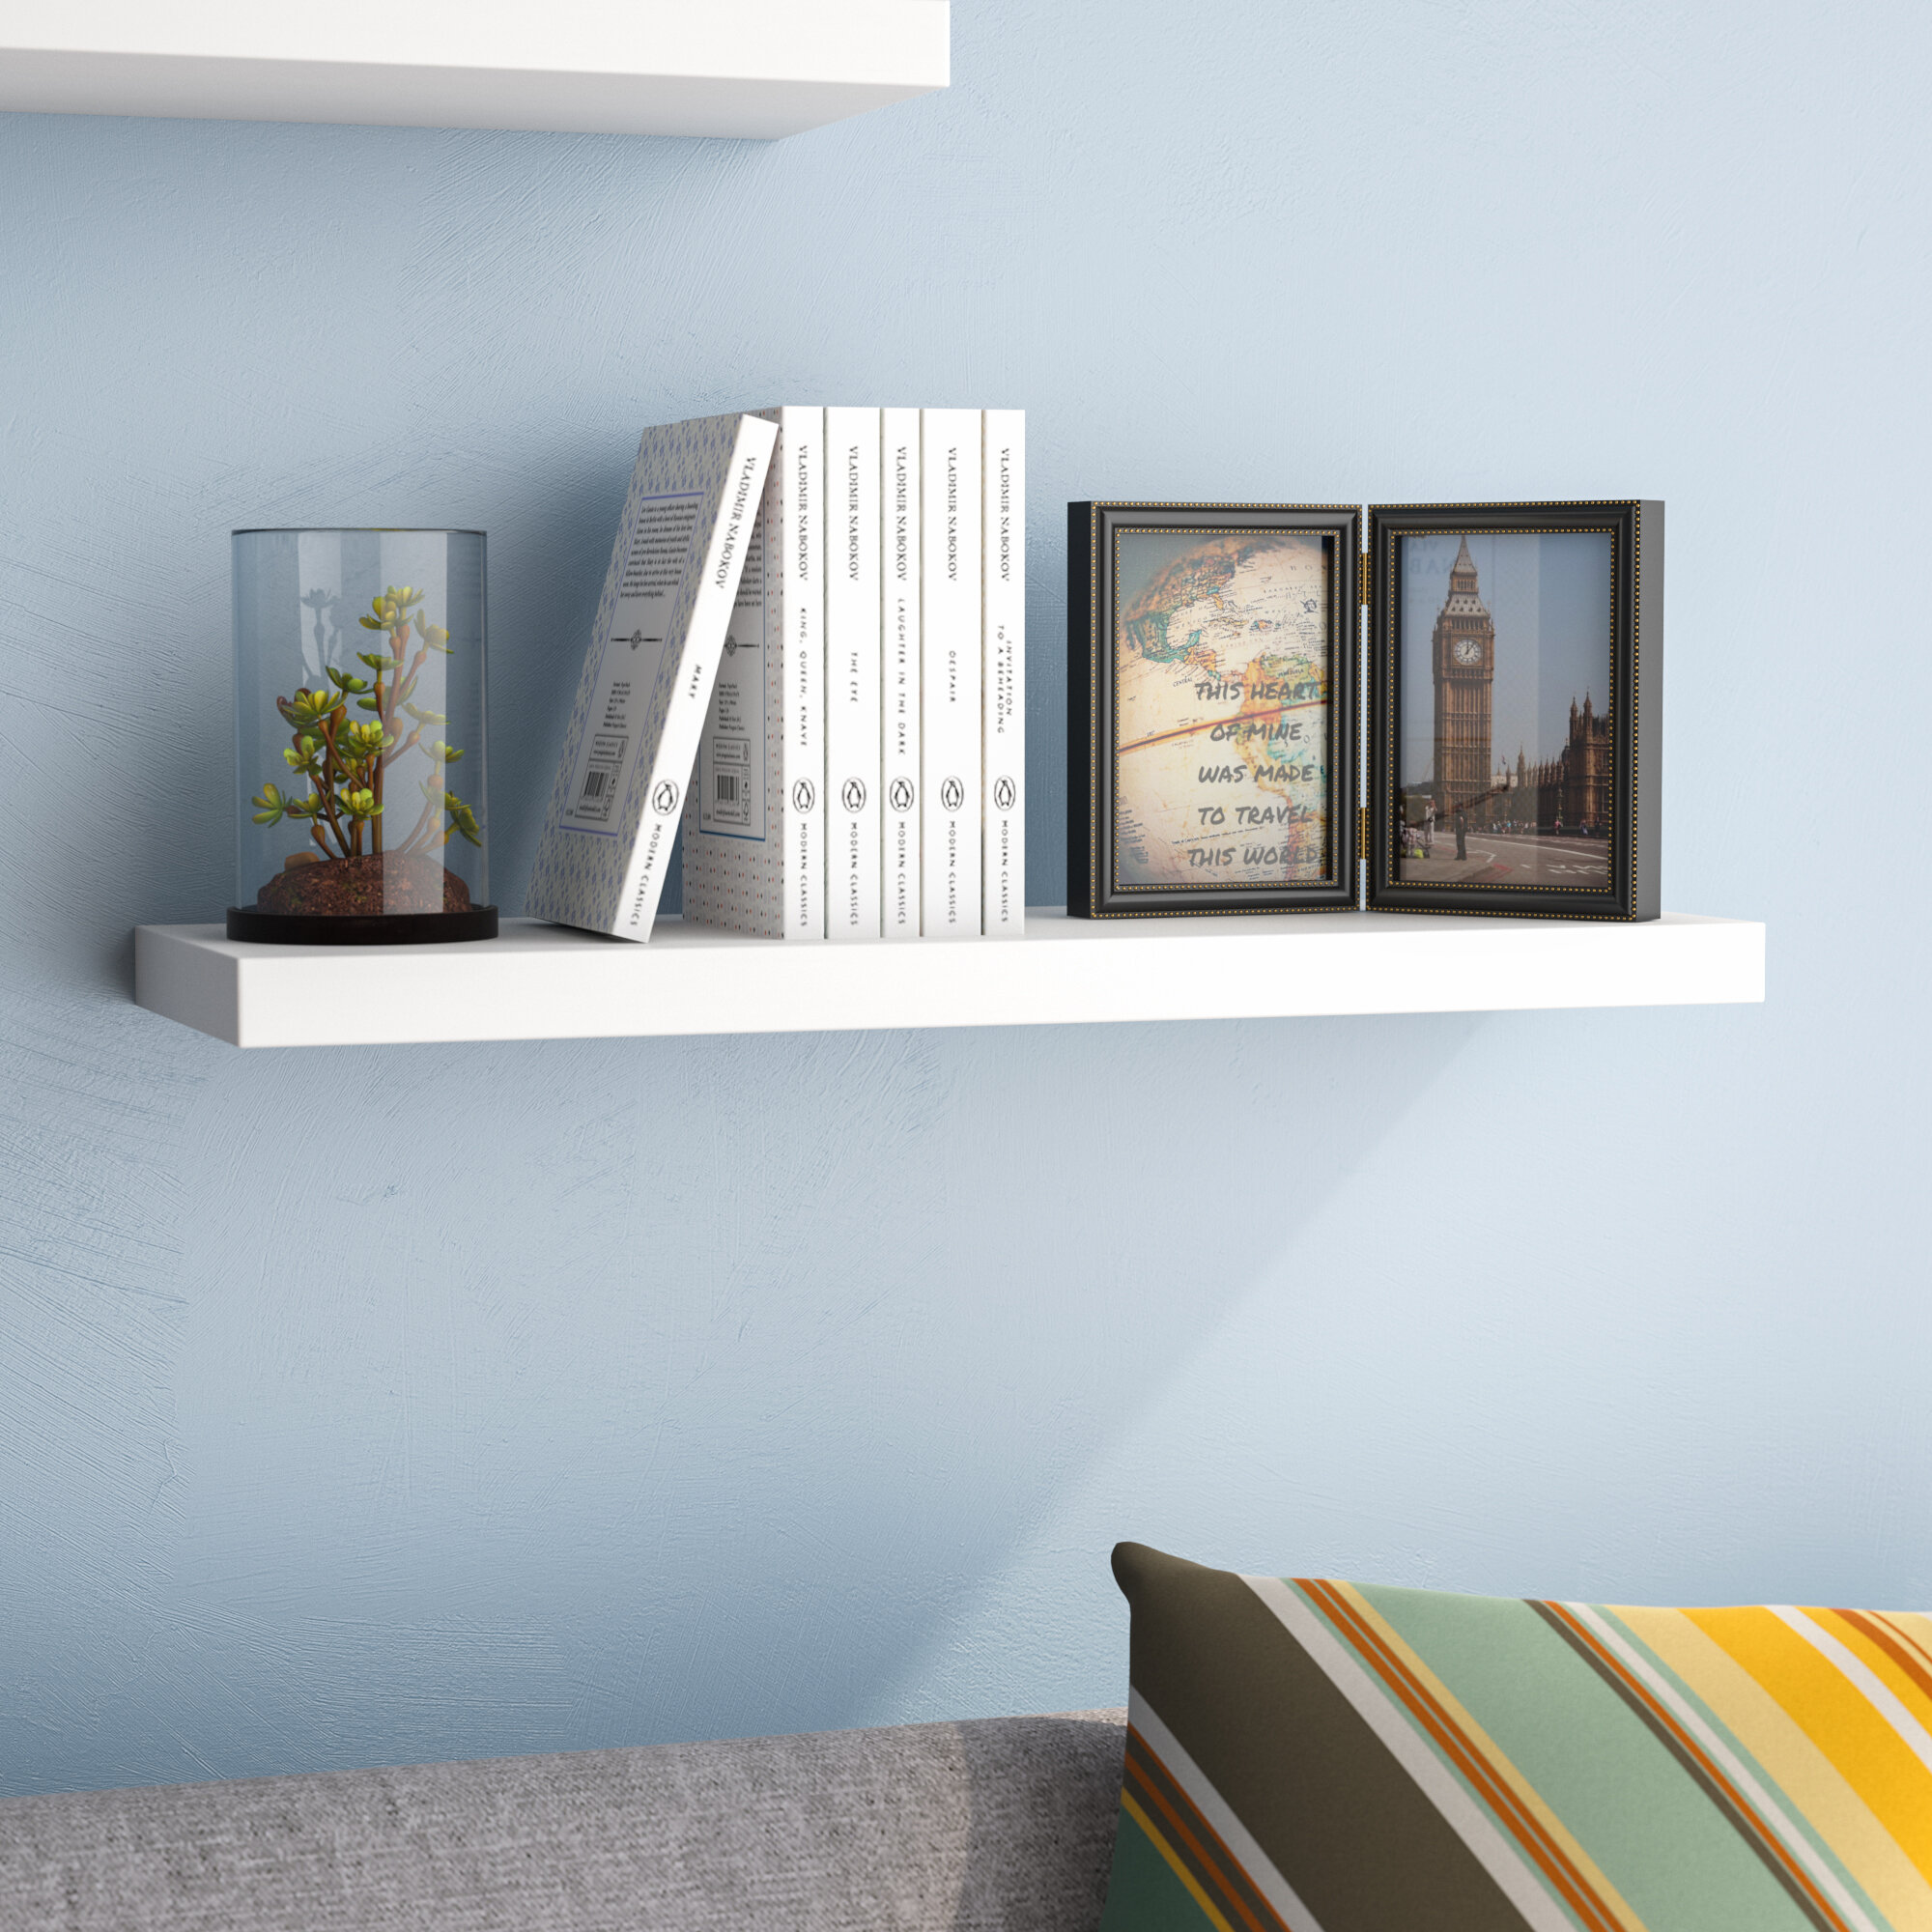 Ebern Designs Board Line Floating Wall Shelf U0026 Reviews | Wayfair